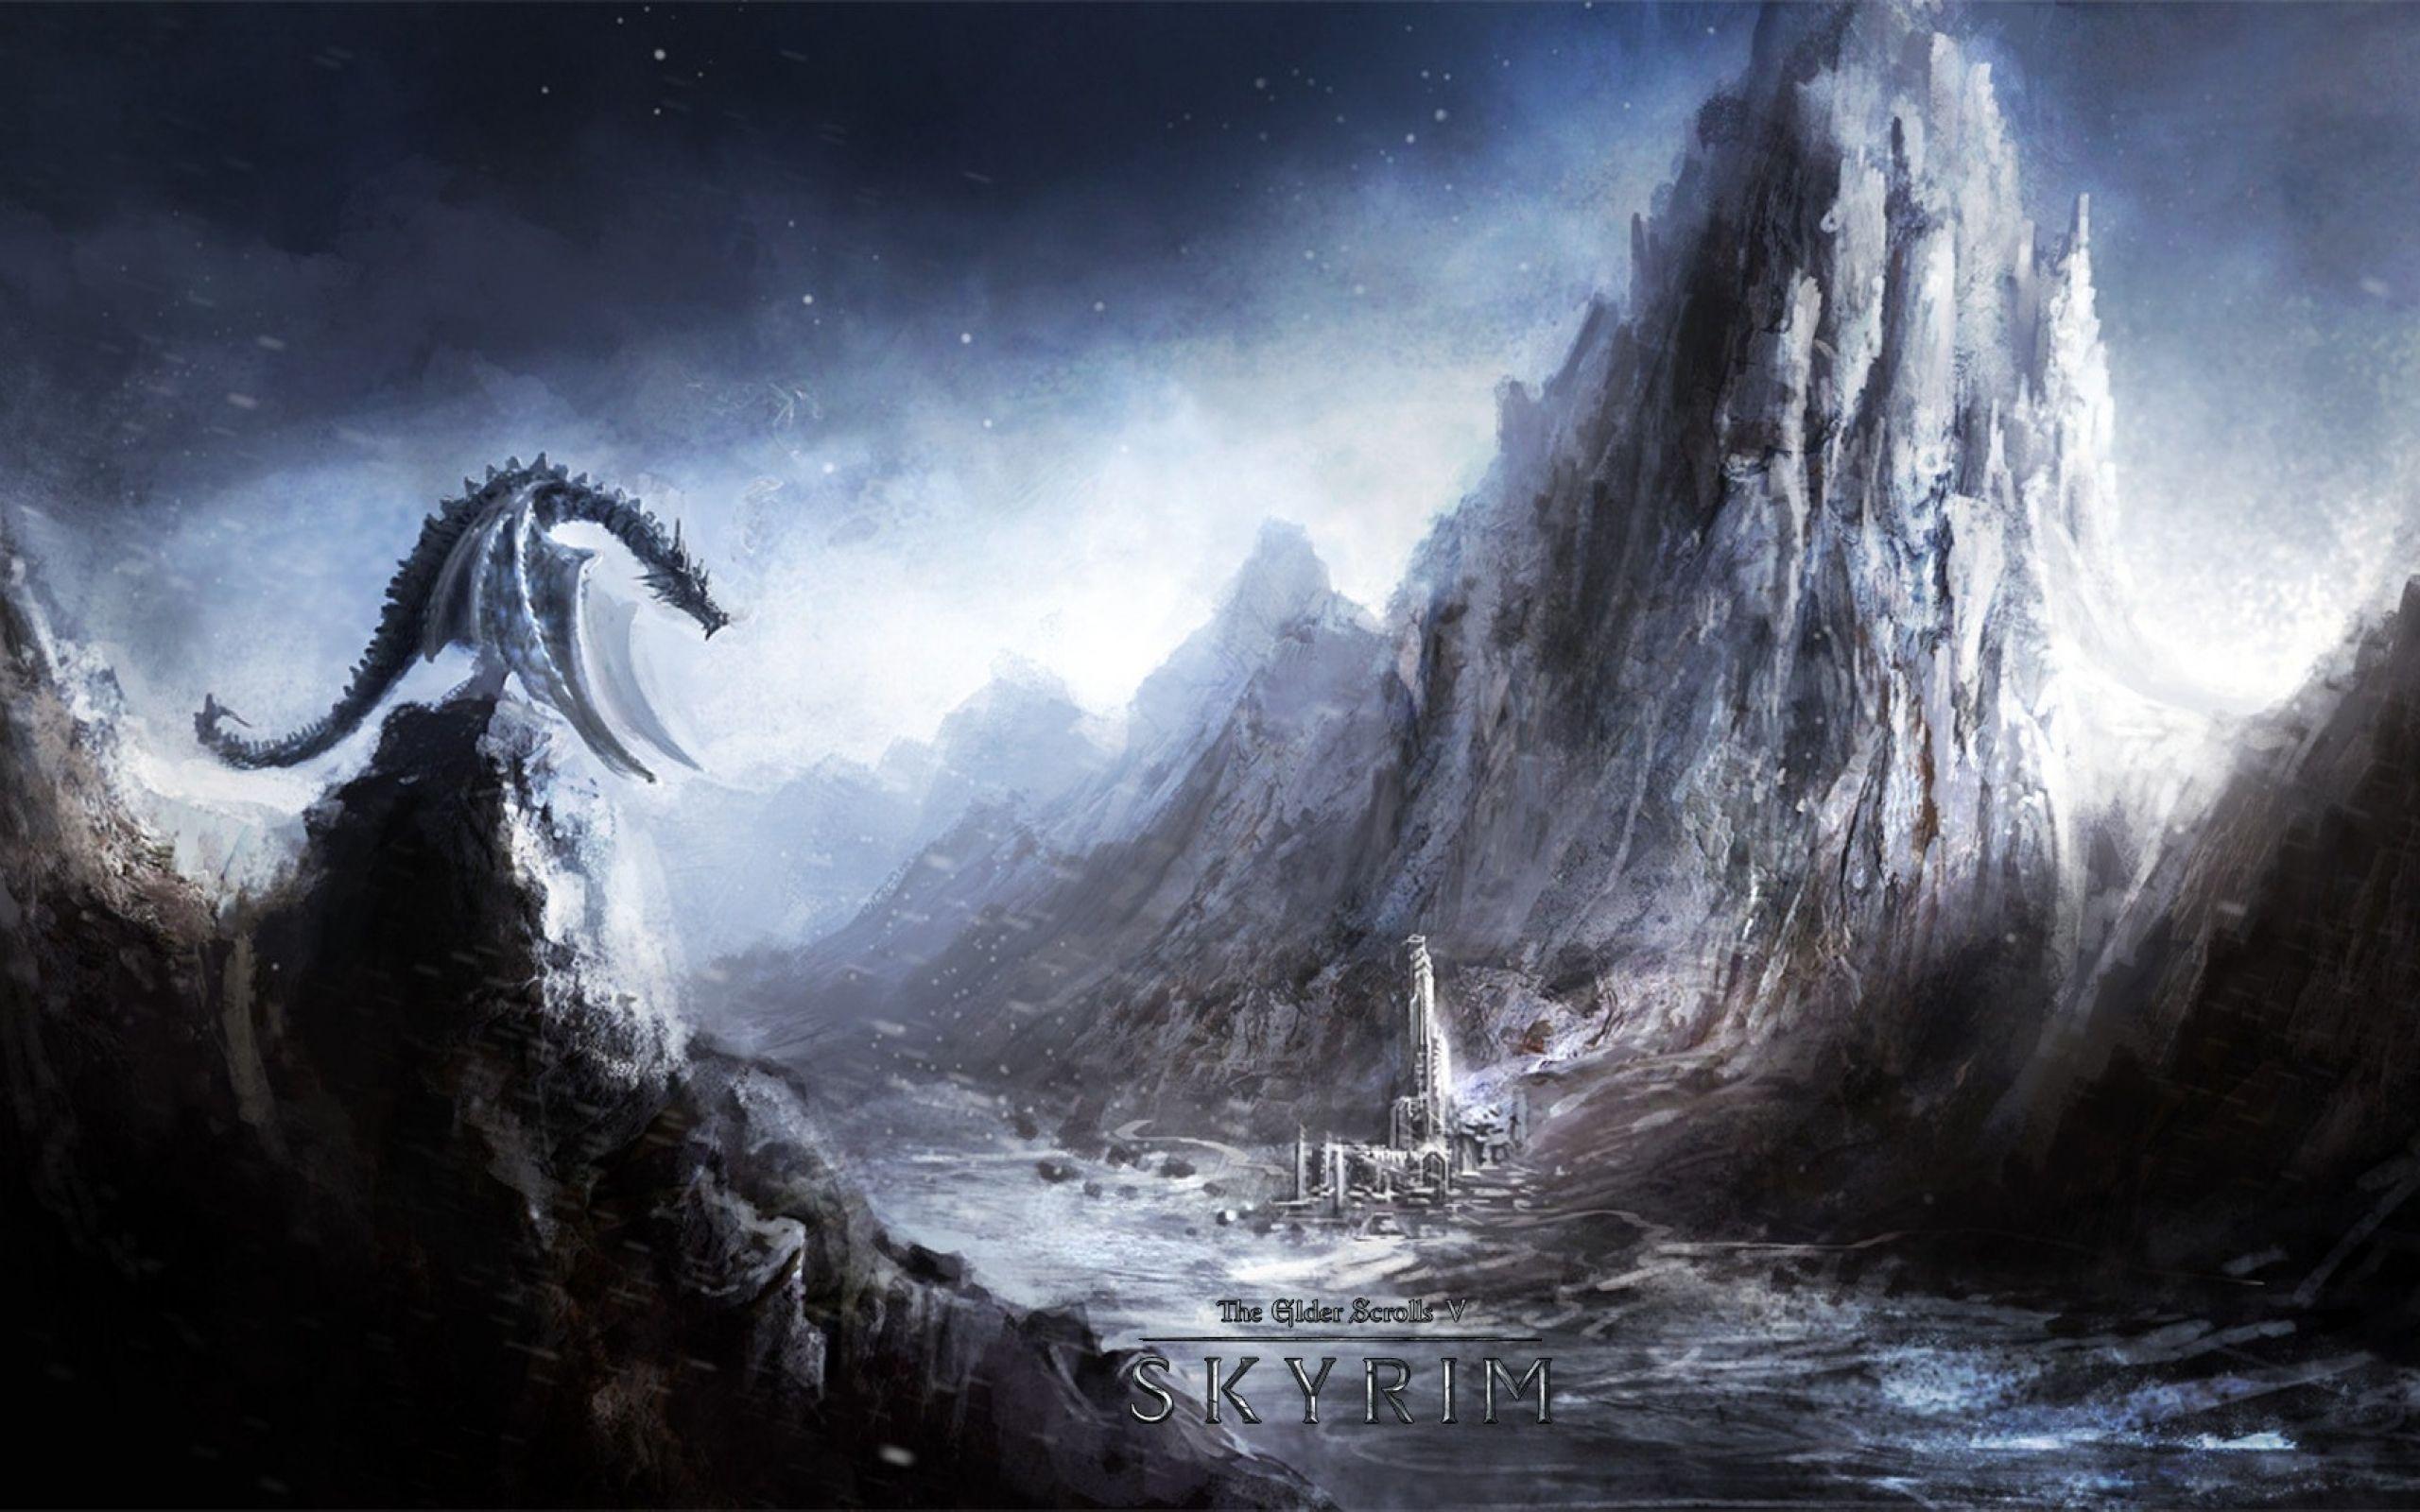 Skyrim Dragon Wallpapers Skyrim Wallpaper Skyrim Art Elder Scrolls Skyrim